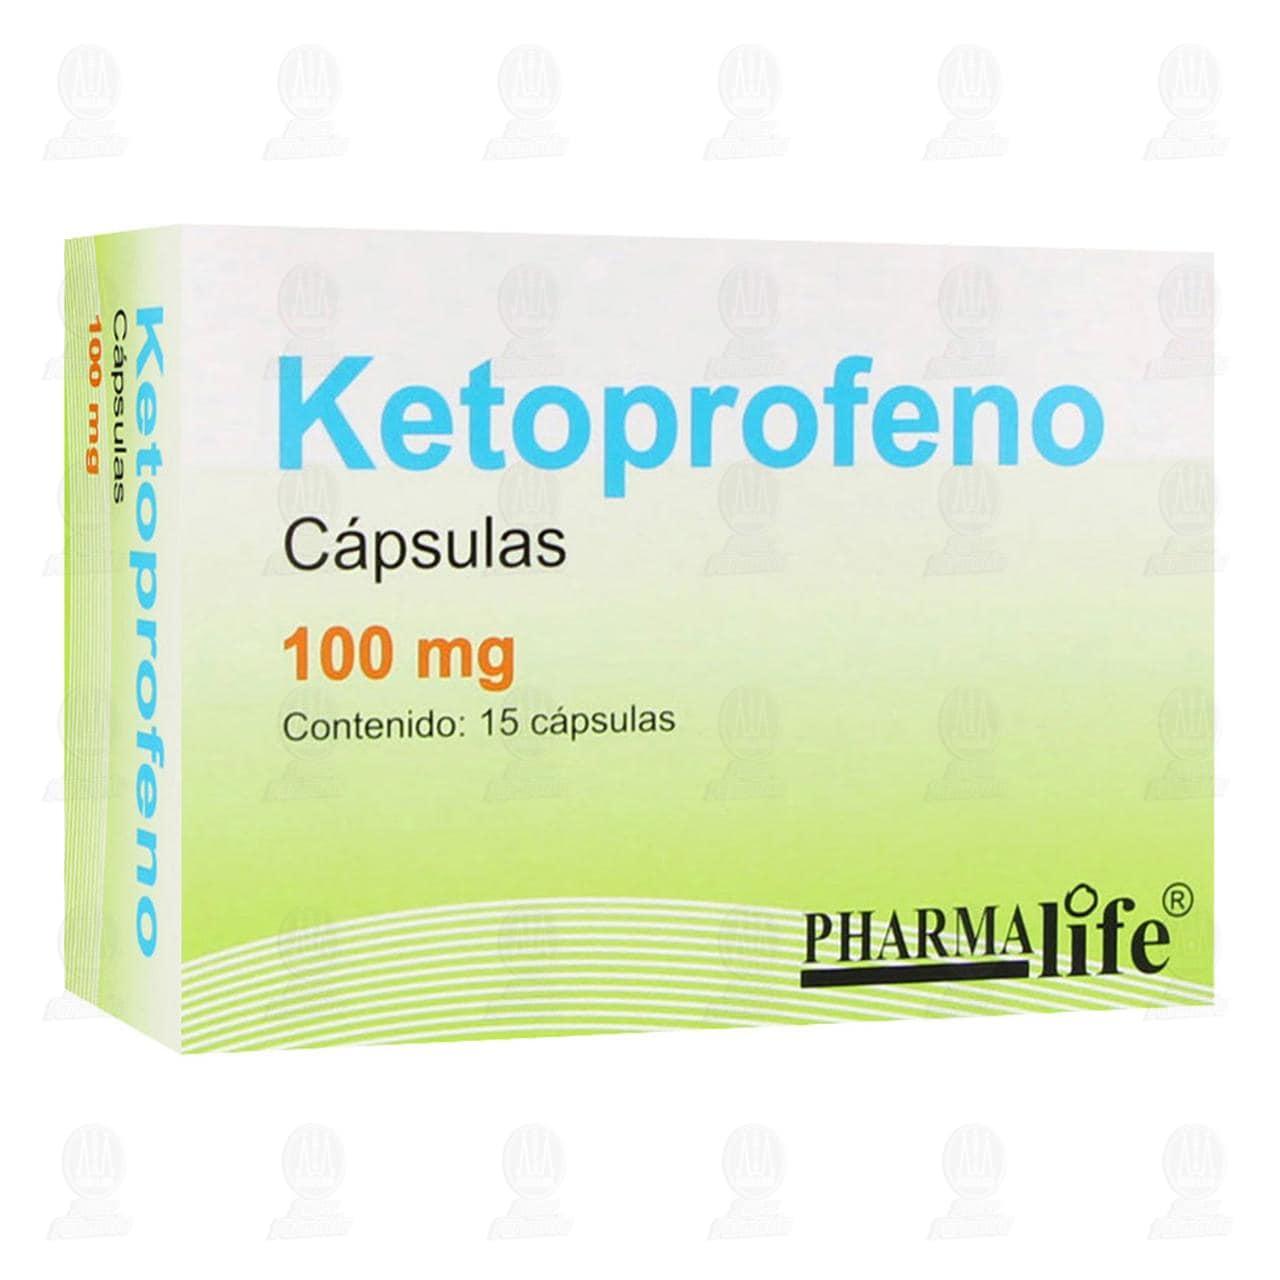 Comprar Ketoprofeno 100mg 15 Cápsulas Pharmalife en Farmacias Guadalajara